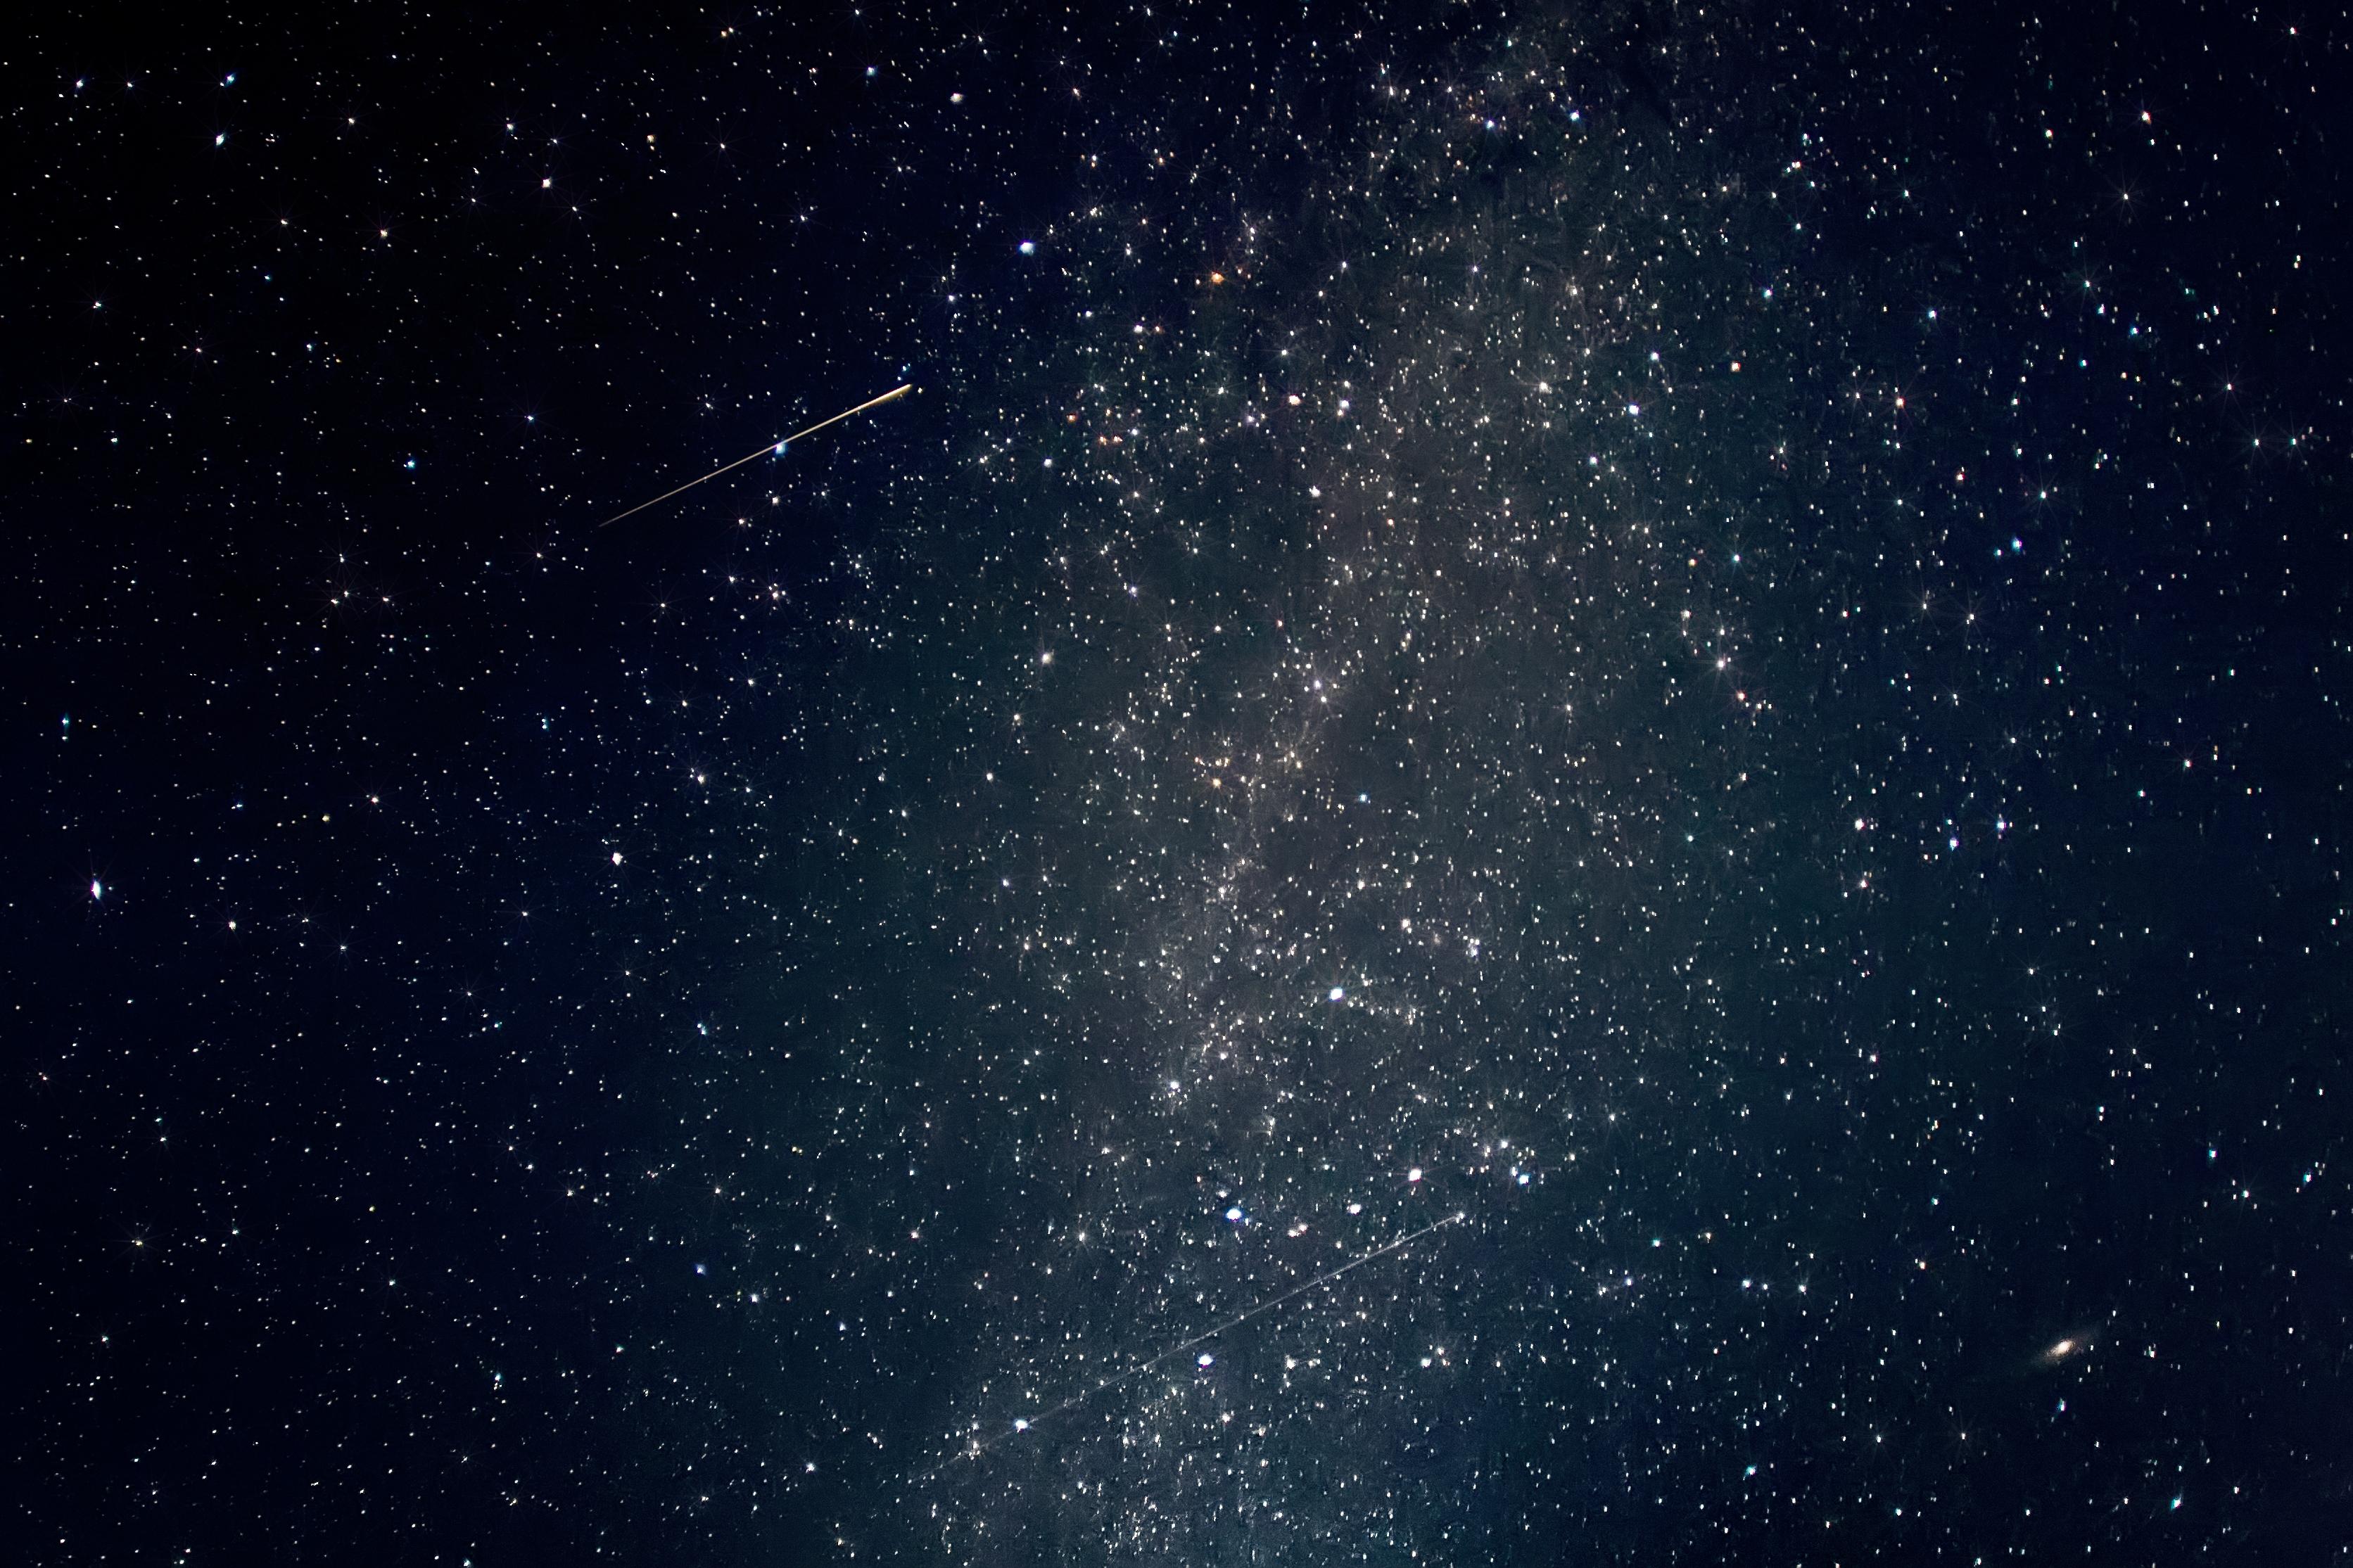 Free Images : sky, night, star, cosmos, atmosphere, dark